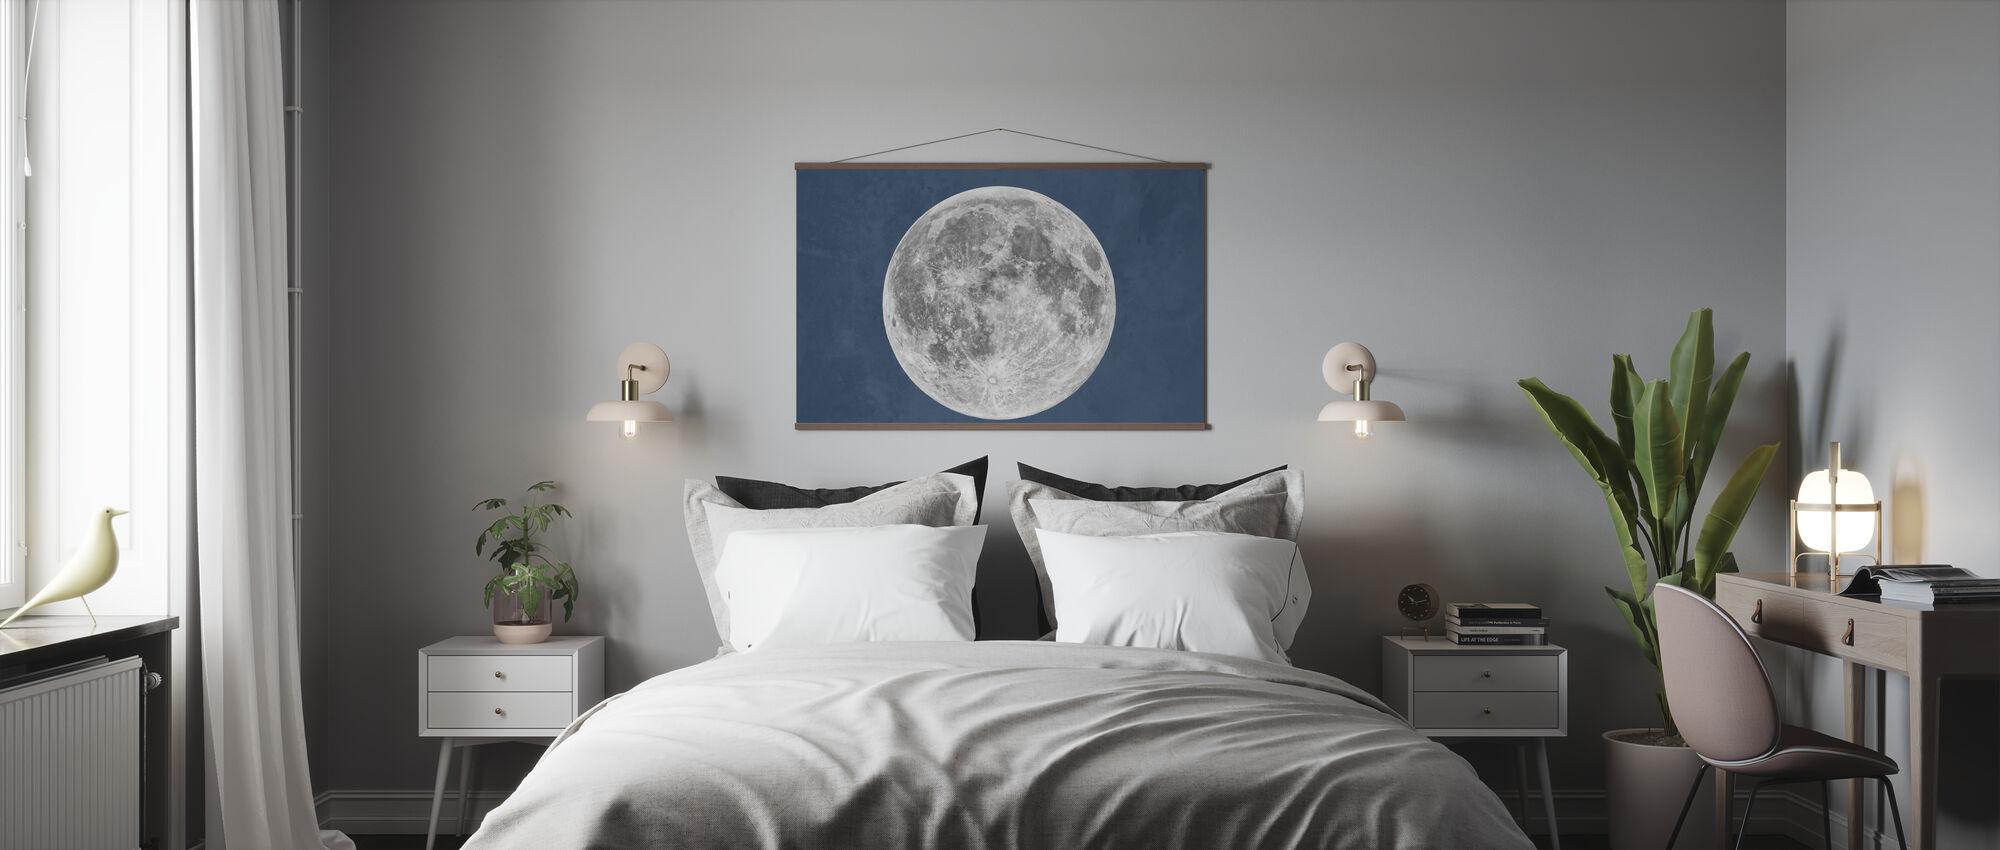 Luna Blu - Poster - Camera da letto